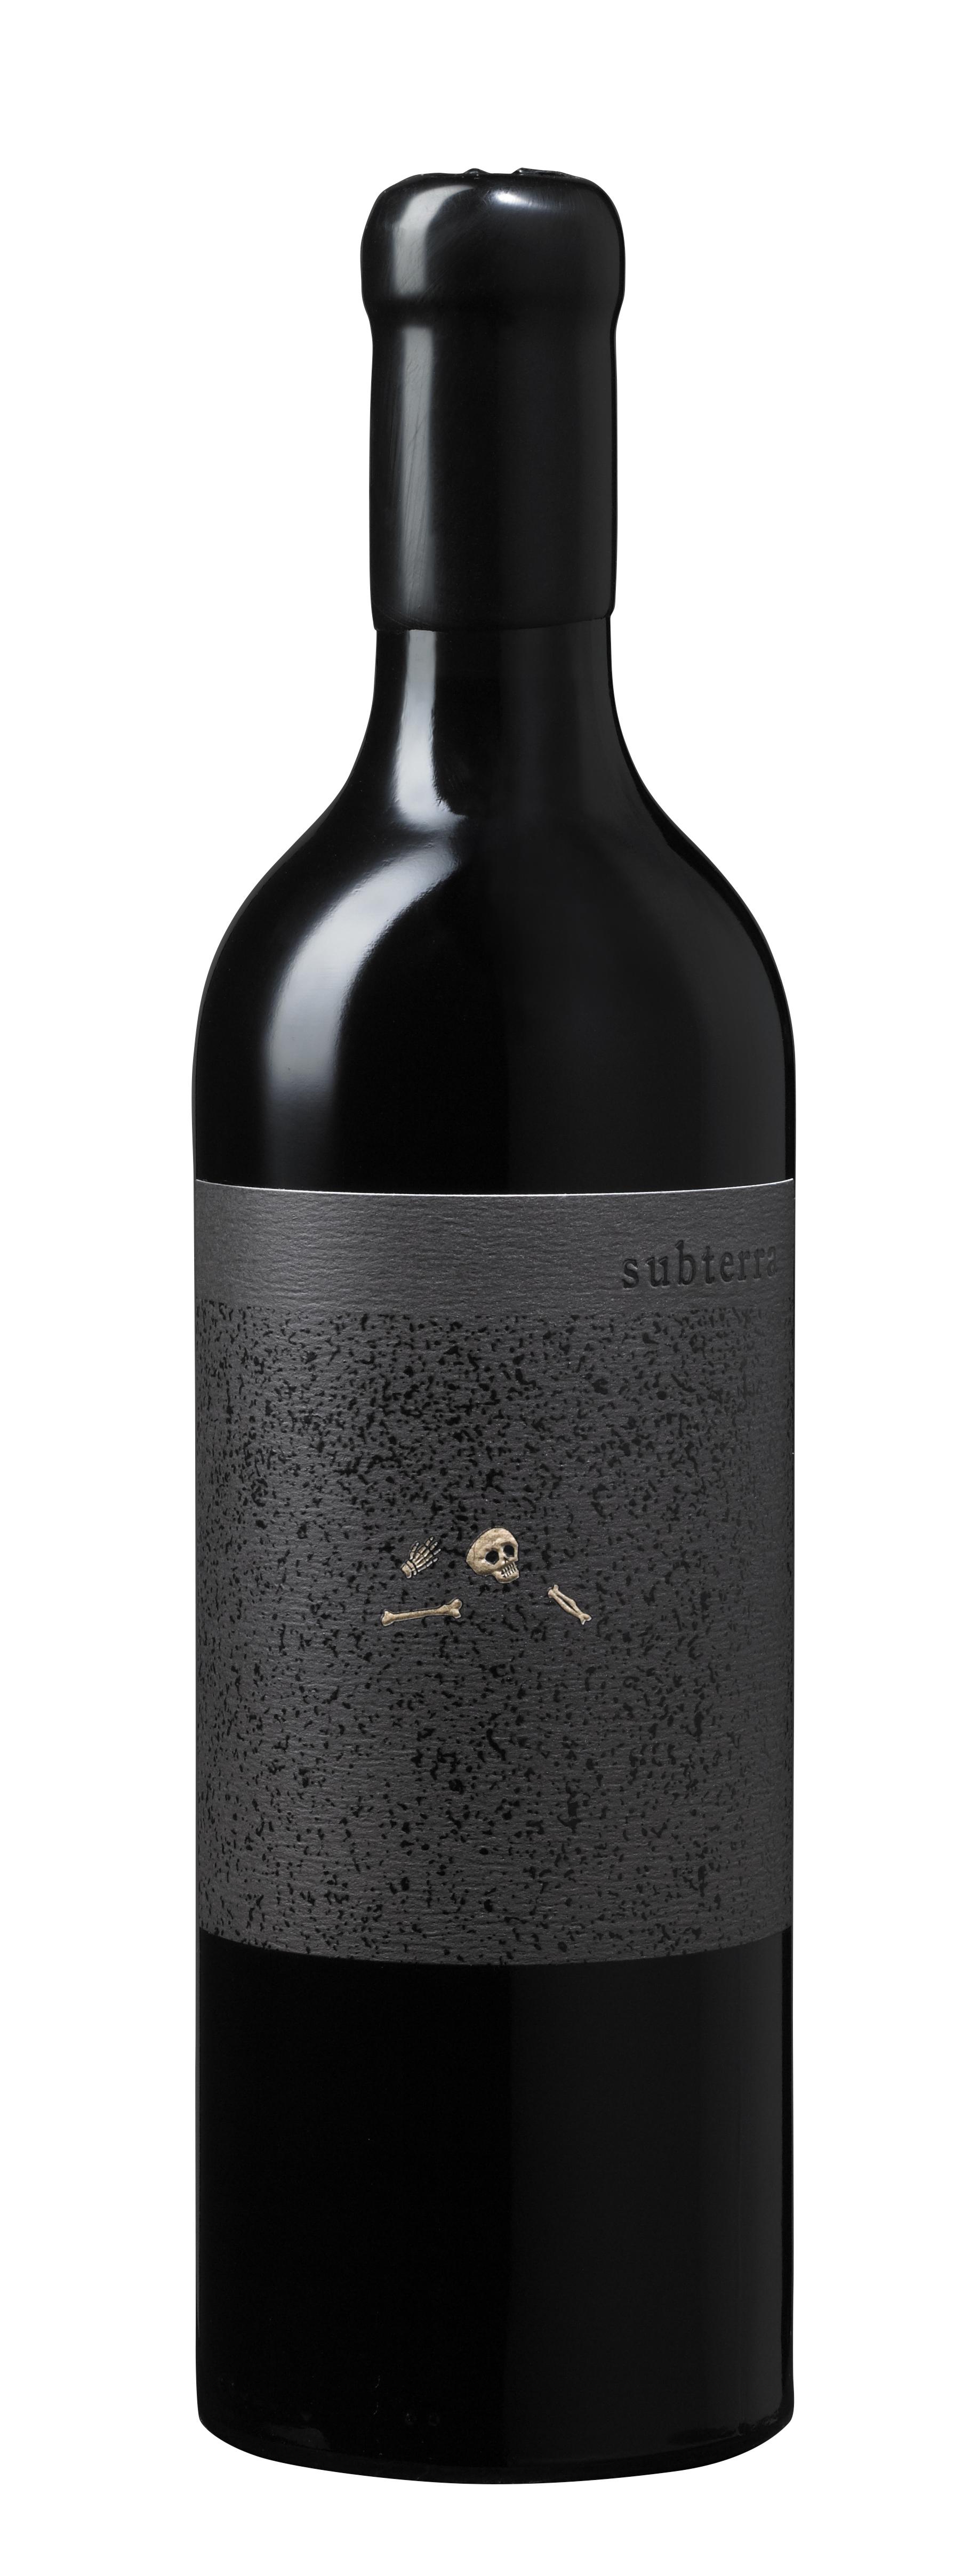 SubterraSingle Bottle.jpg